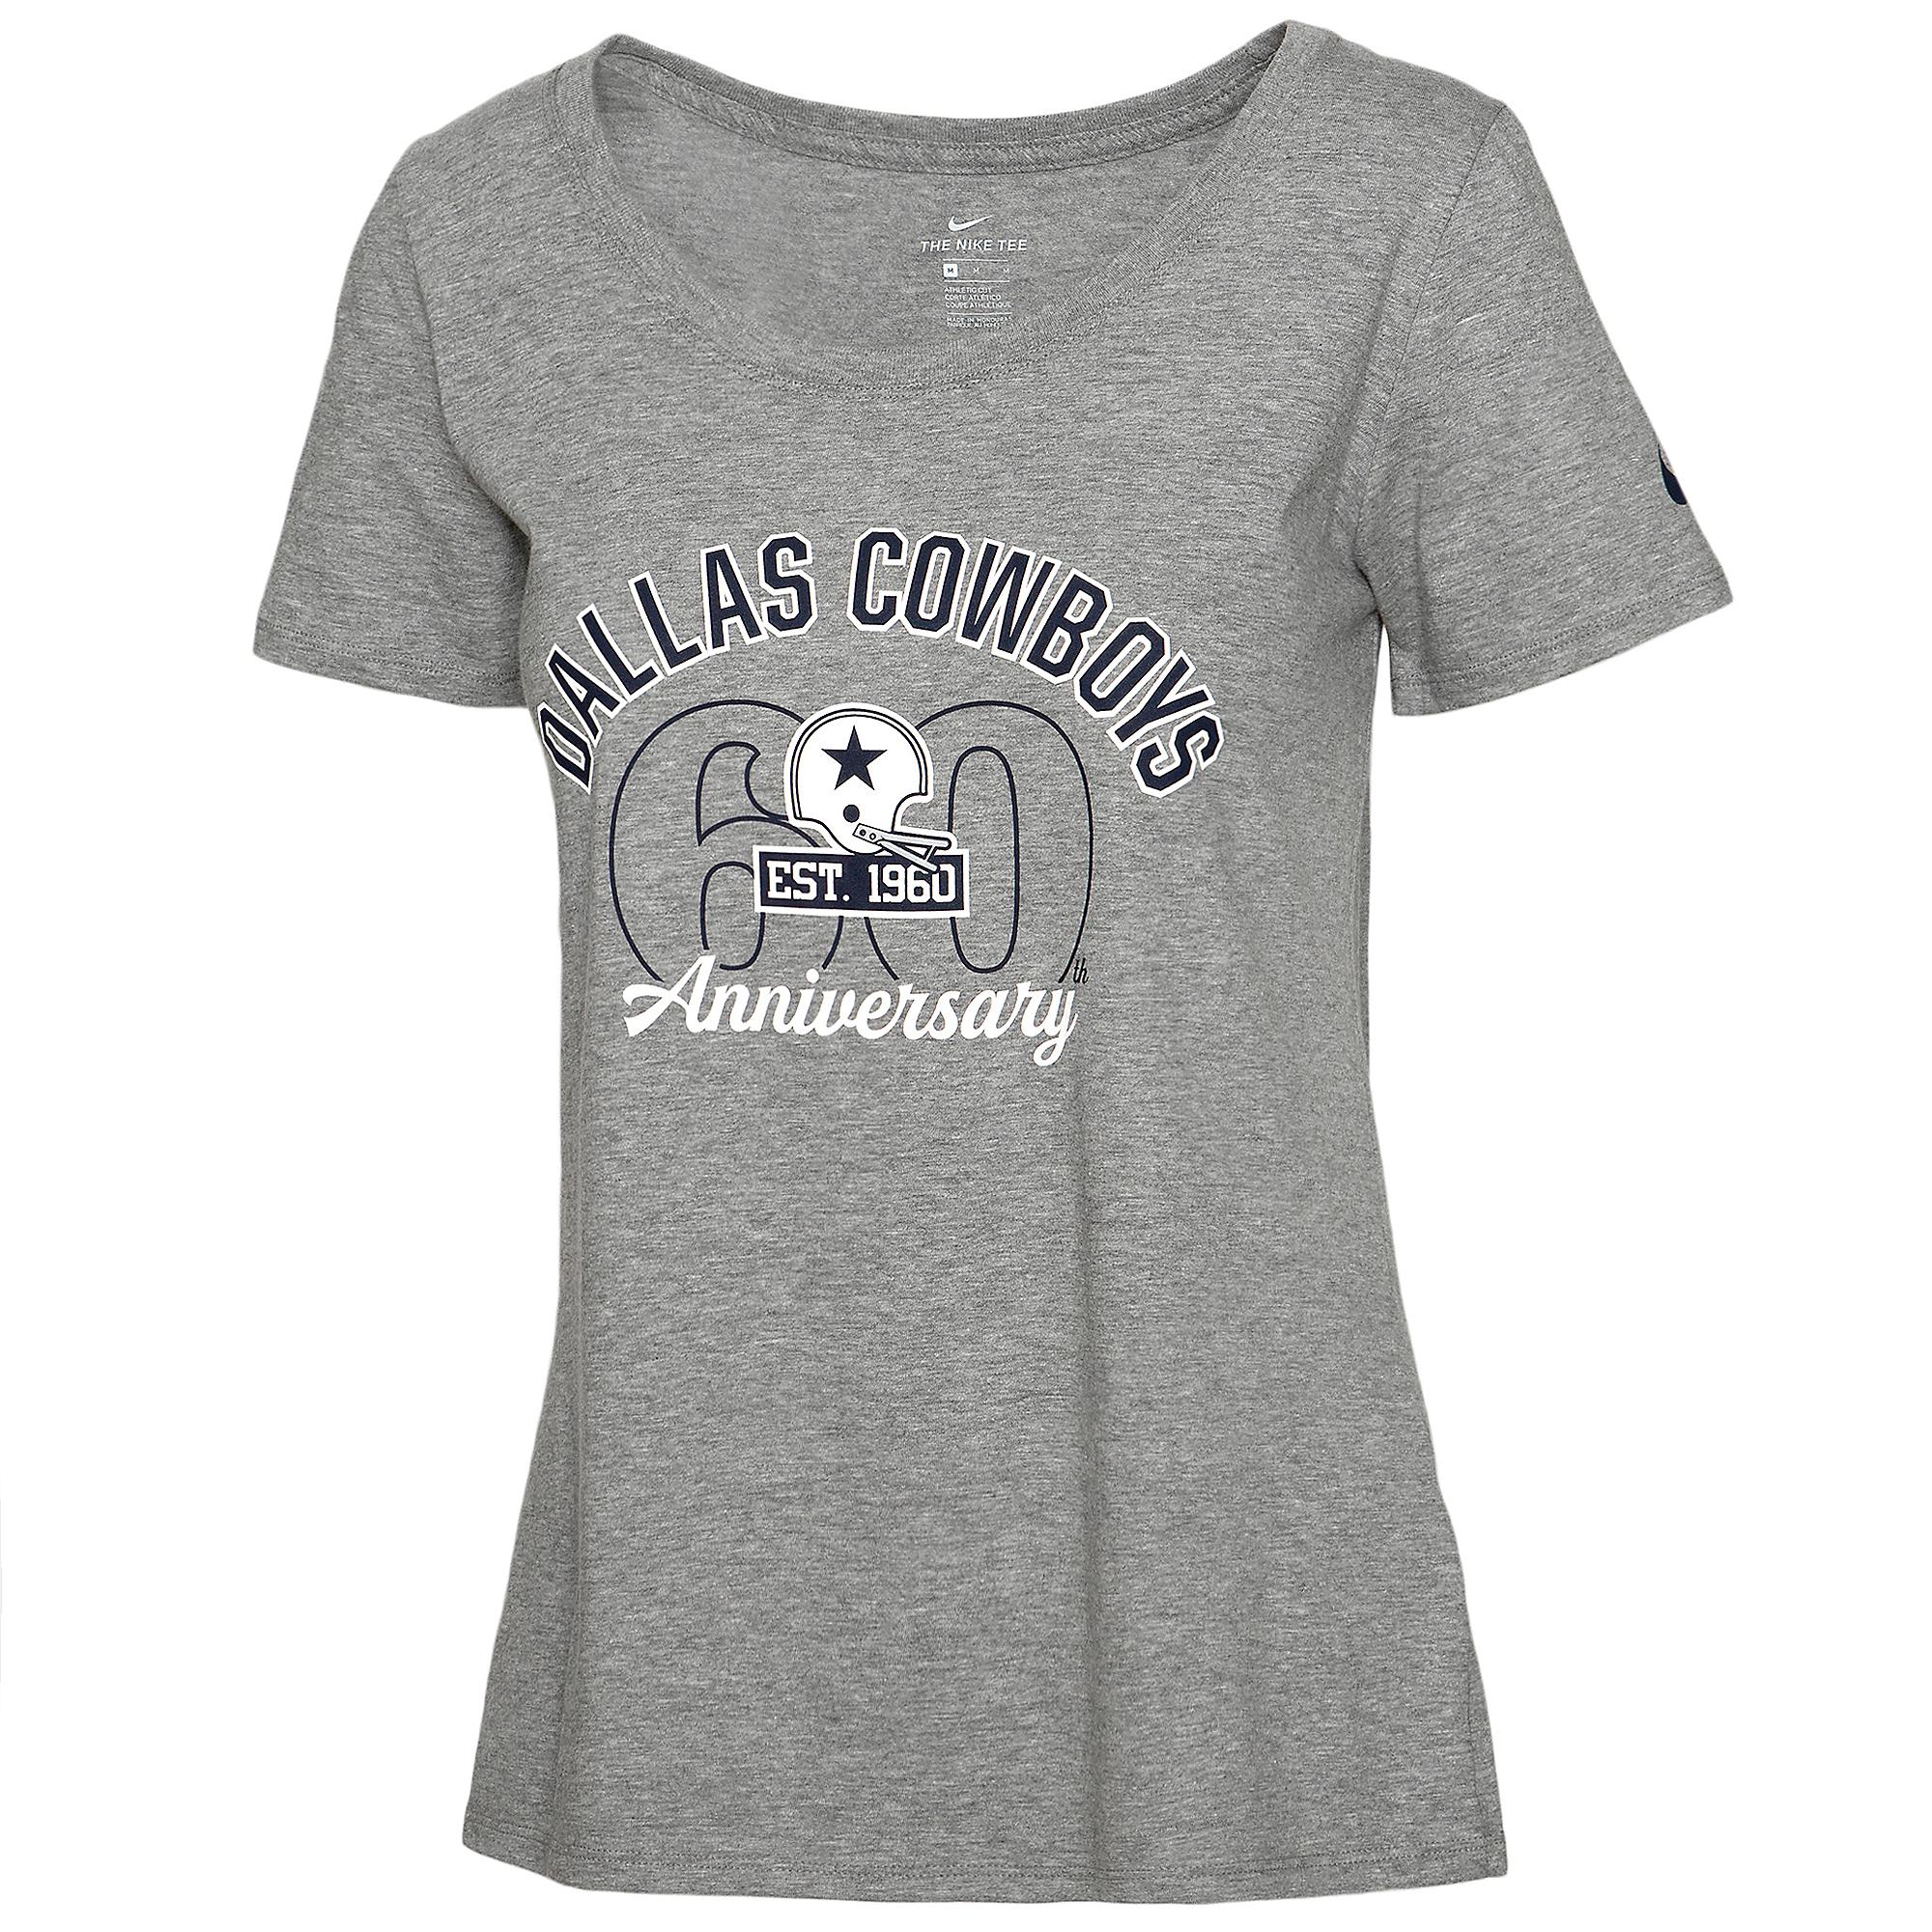 Dallas Cowboys Nike 1960 Womens Short Sleeve Cotton T-Shirt